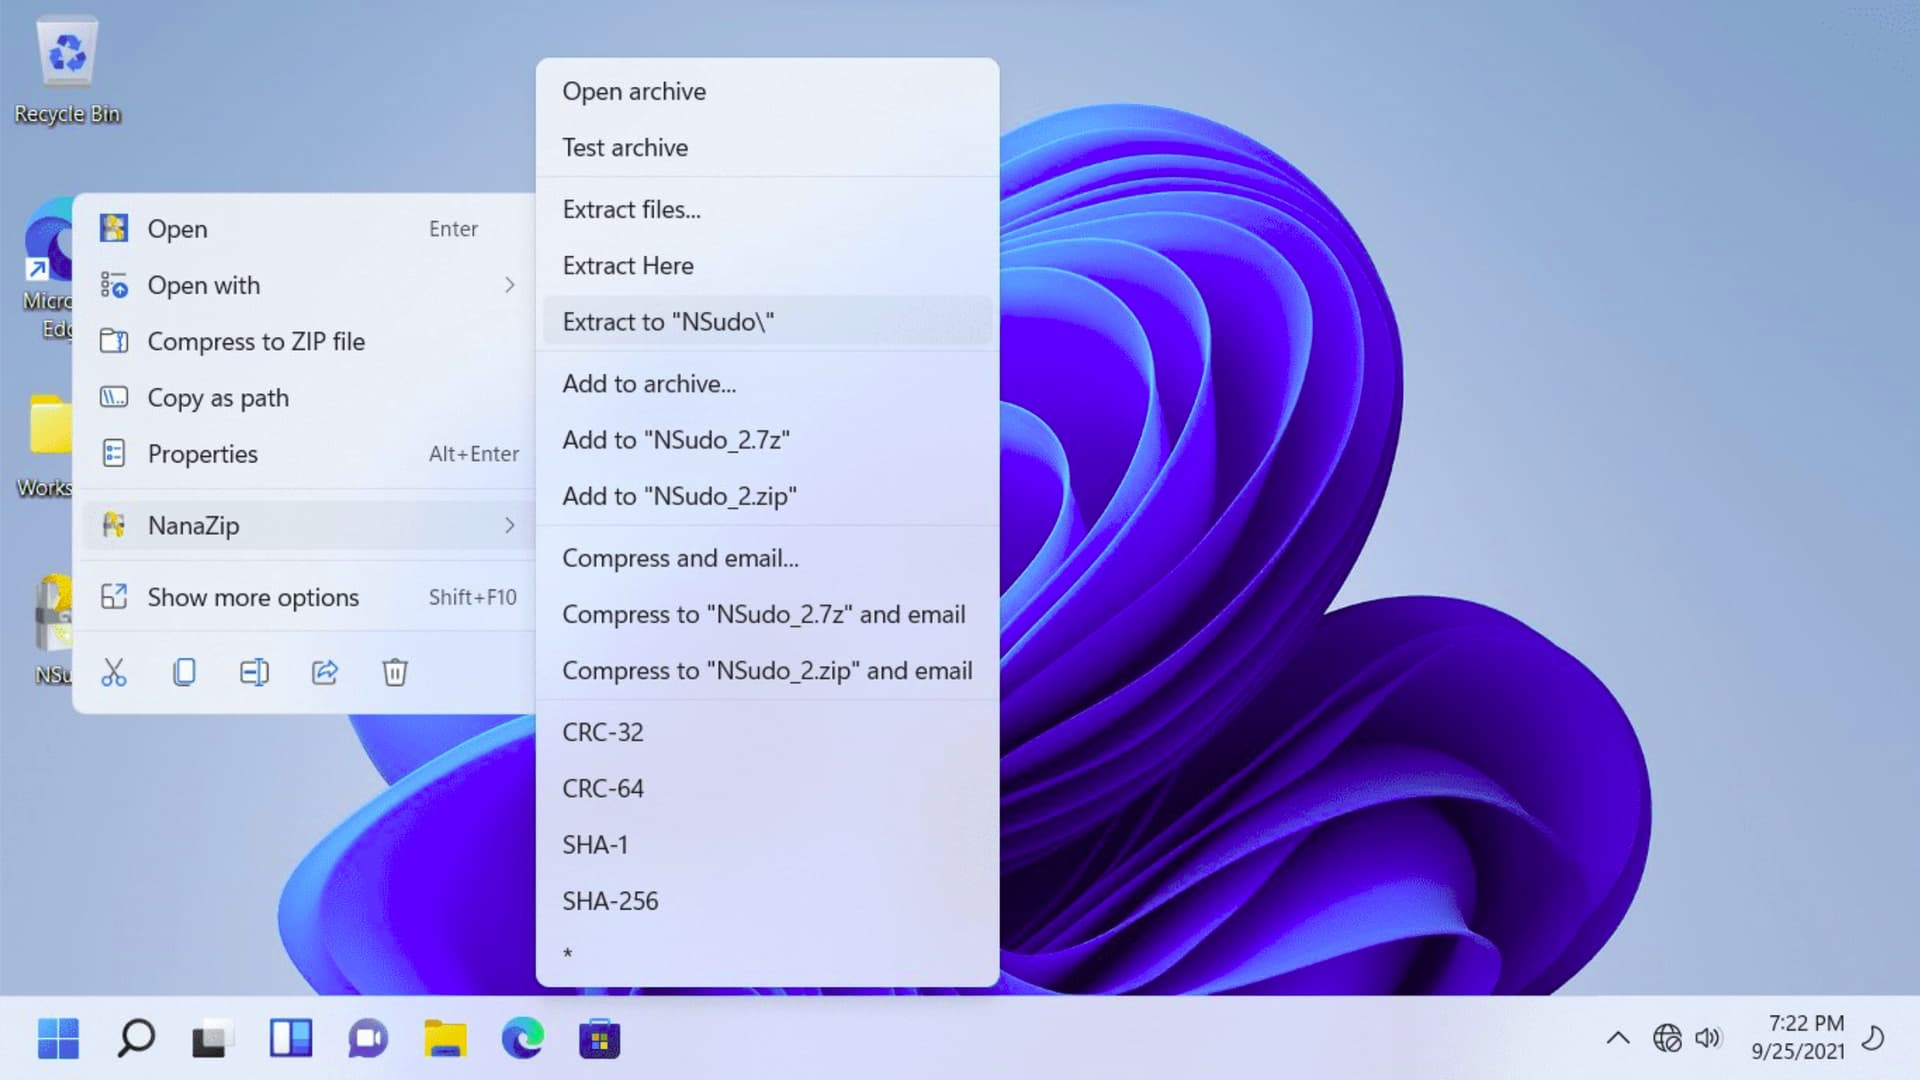 NanaZip - 适配 Windows 11 右键菜单的开源压缩工具,基于 7-Zip 2